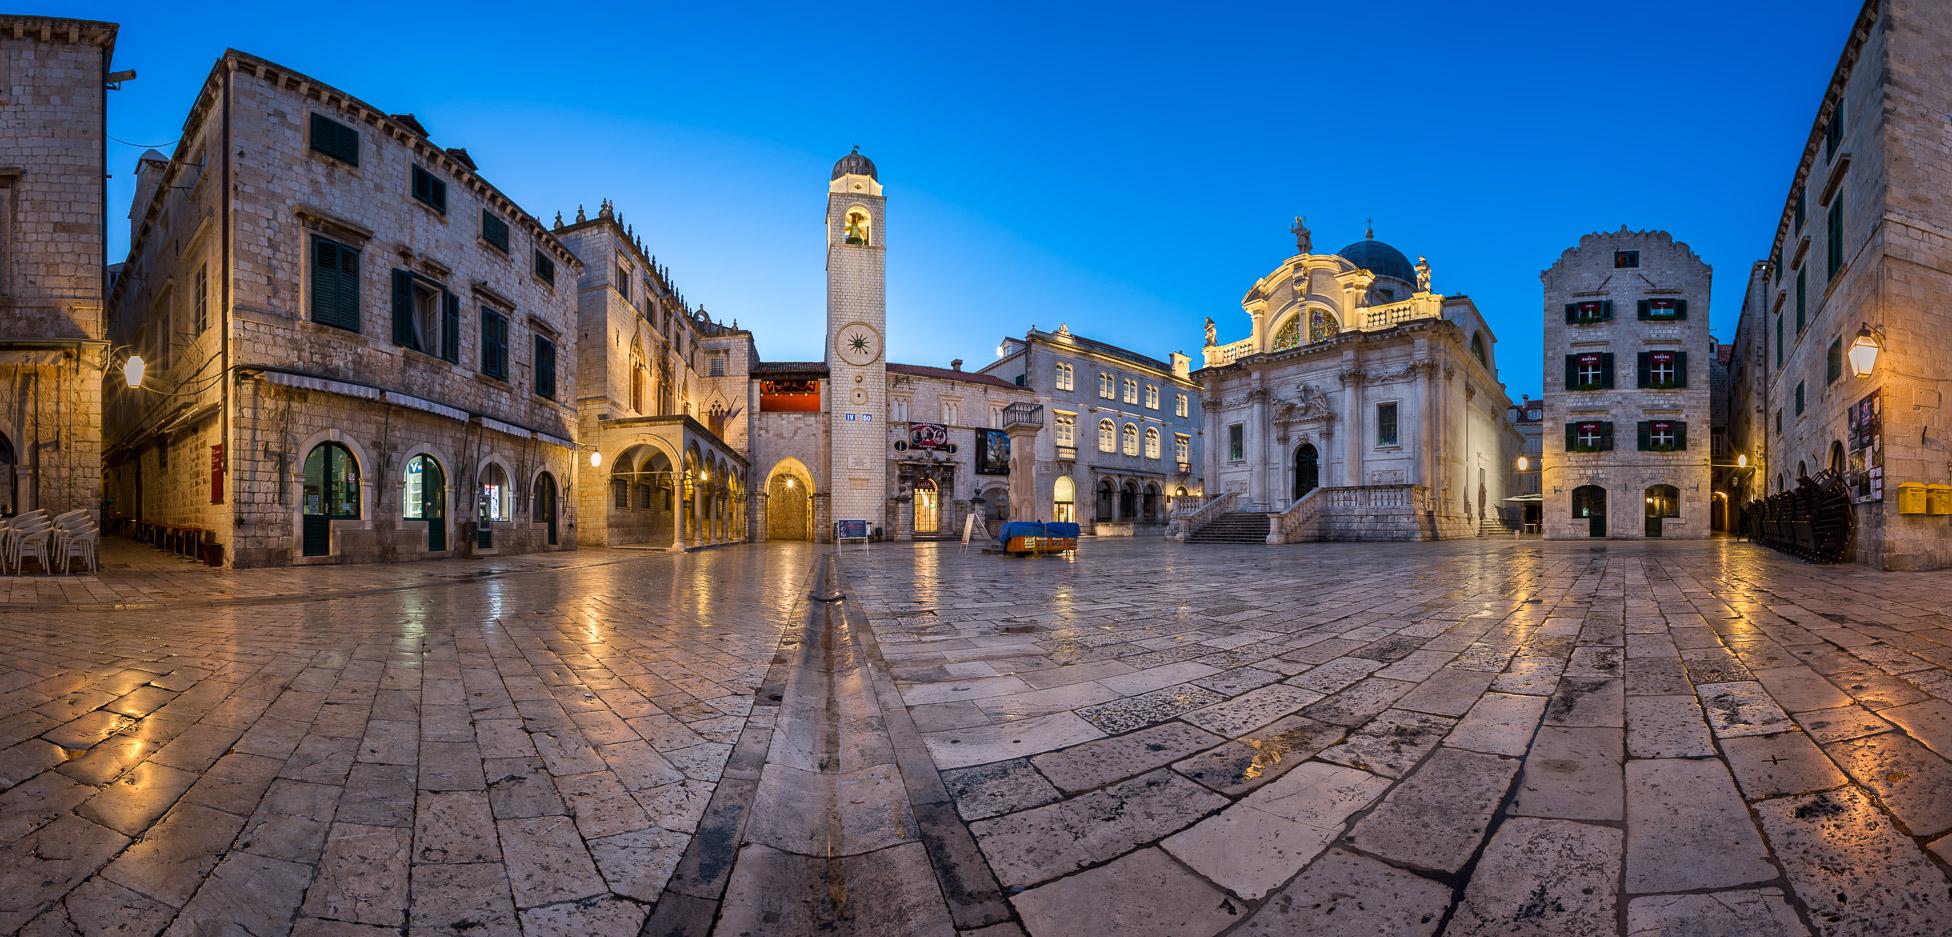 Panorama of Luza Square and Sponza Palace in Dubrovnik, Croatia